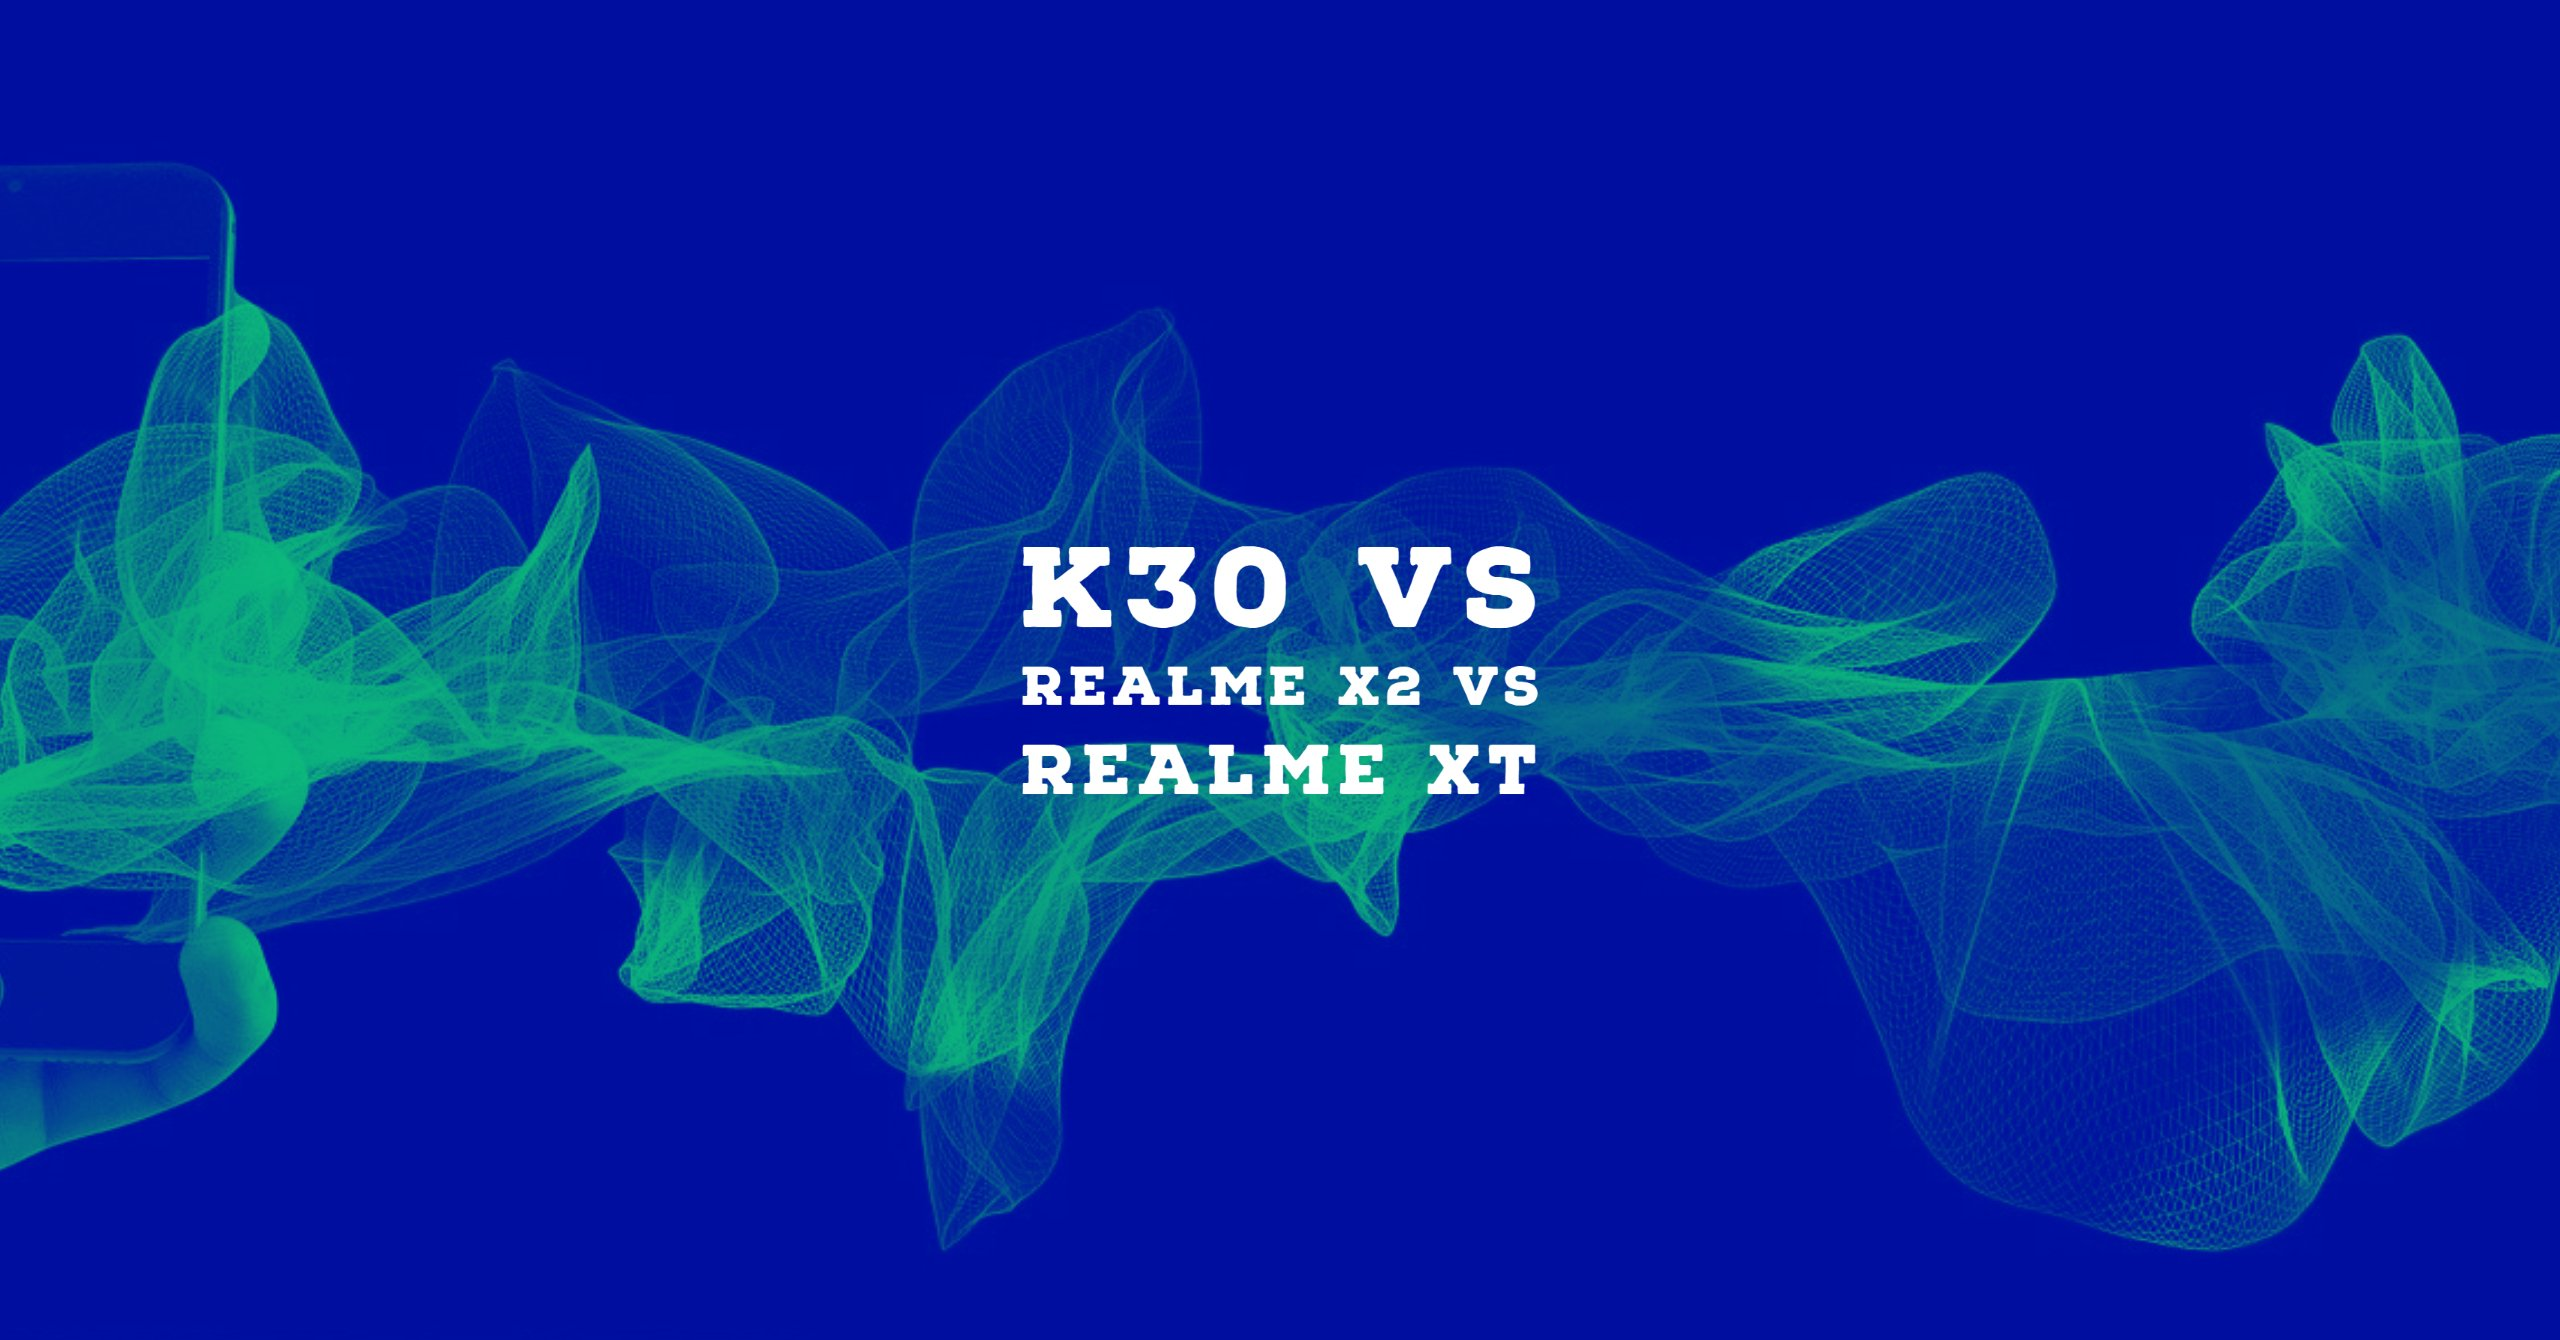 K30 vs Realme X2 vs Realme XT